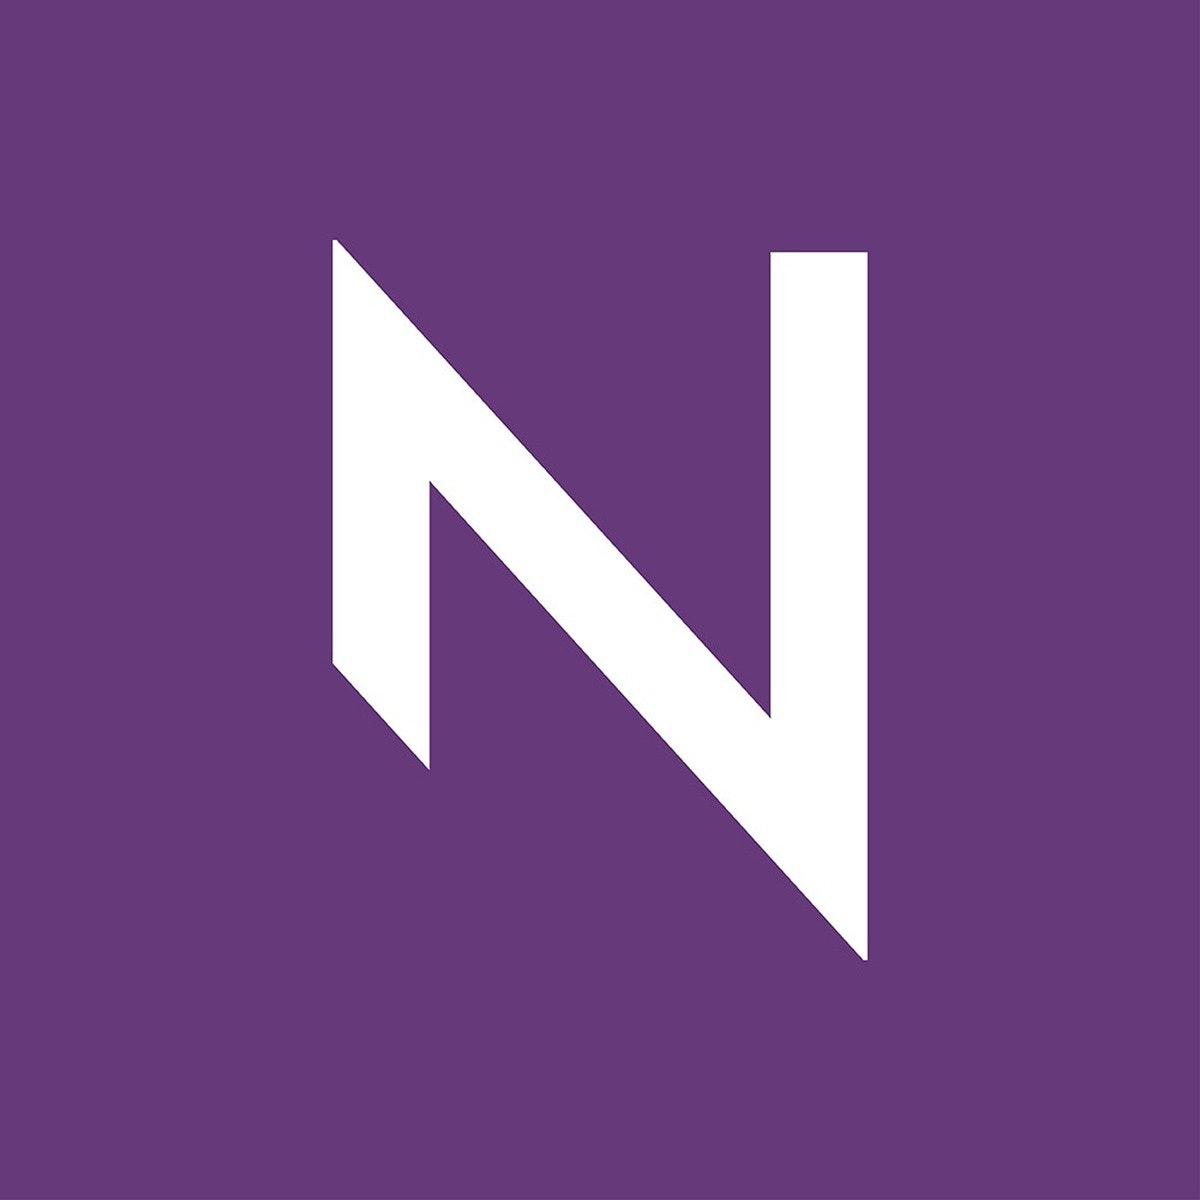 Frontend Entwickler (React oder Angular) (m/w/d) - Hannover